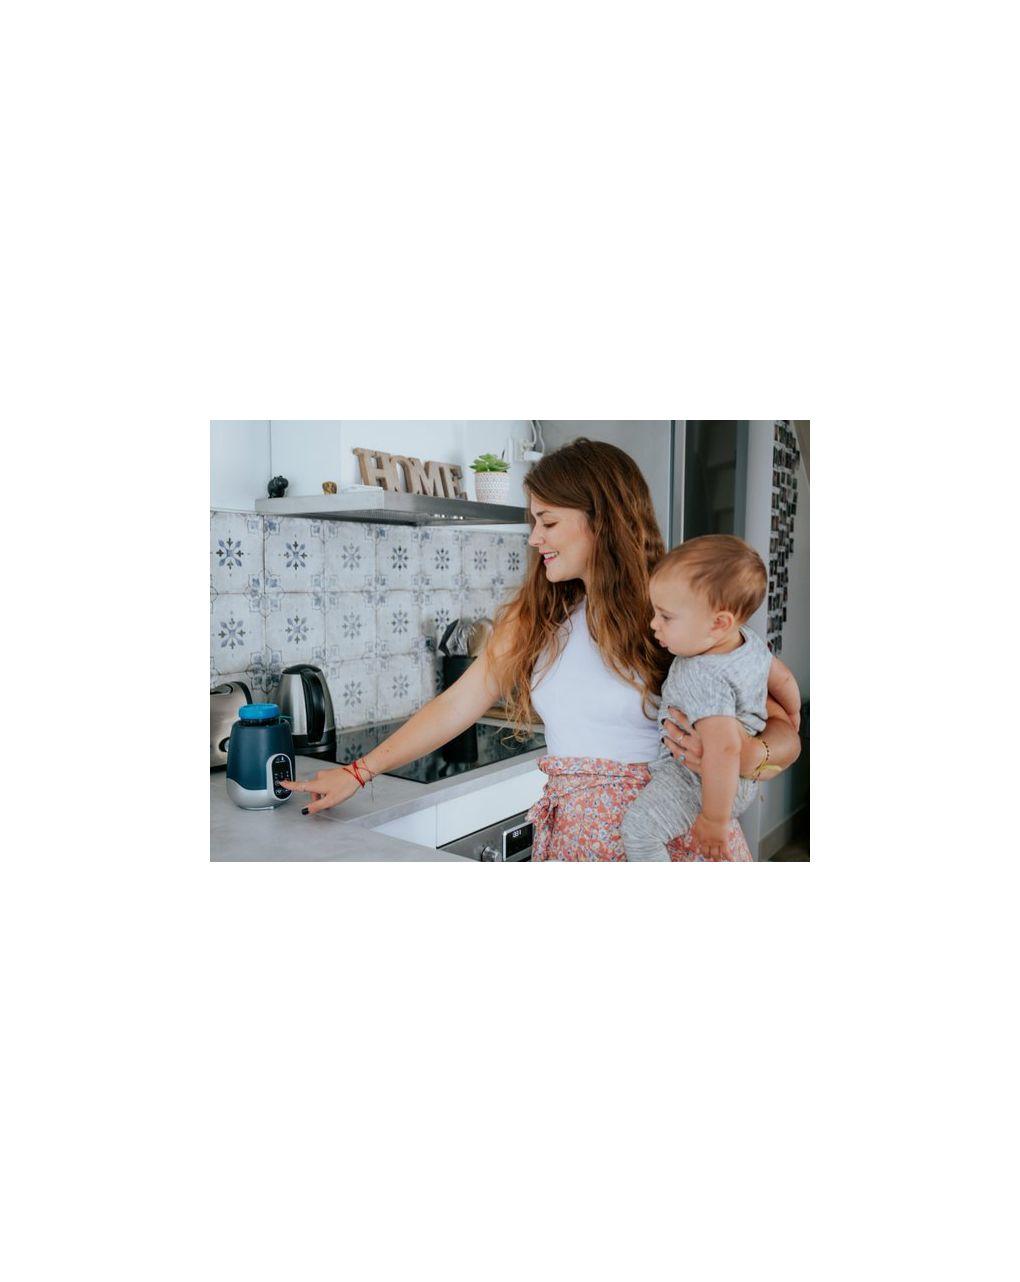 Nutrismart scaldabiberon digitale casa auto (bagnomaria/vapore) - Babymoov